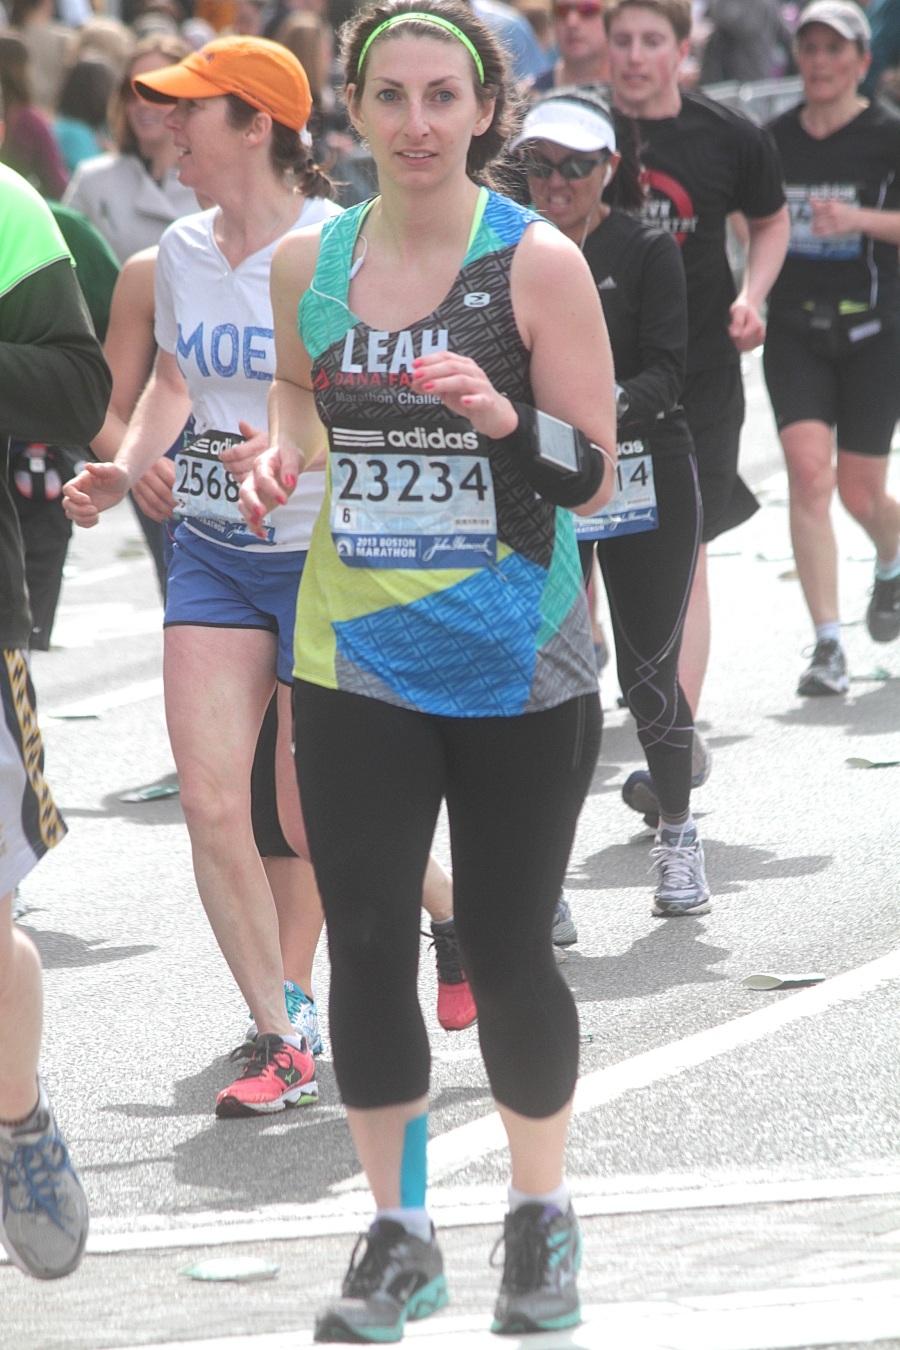 boston marathon 2013 number 23234